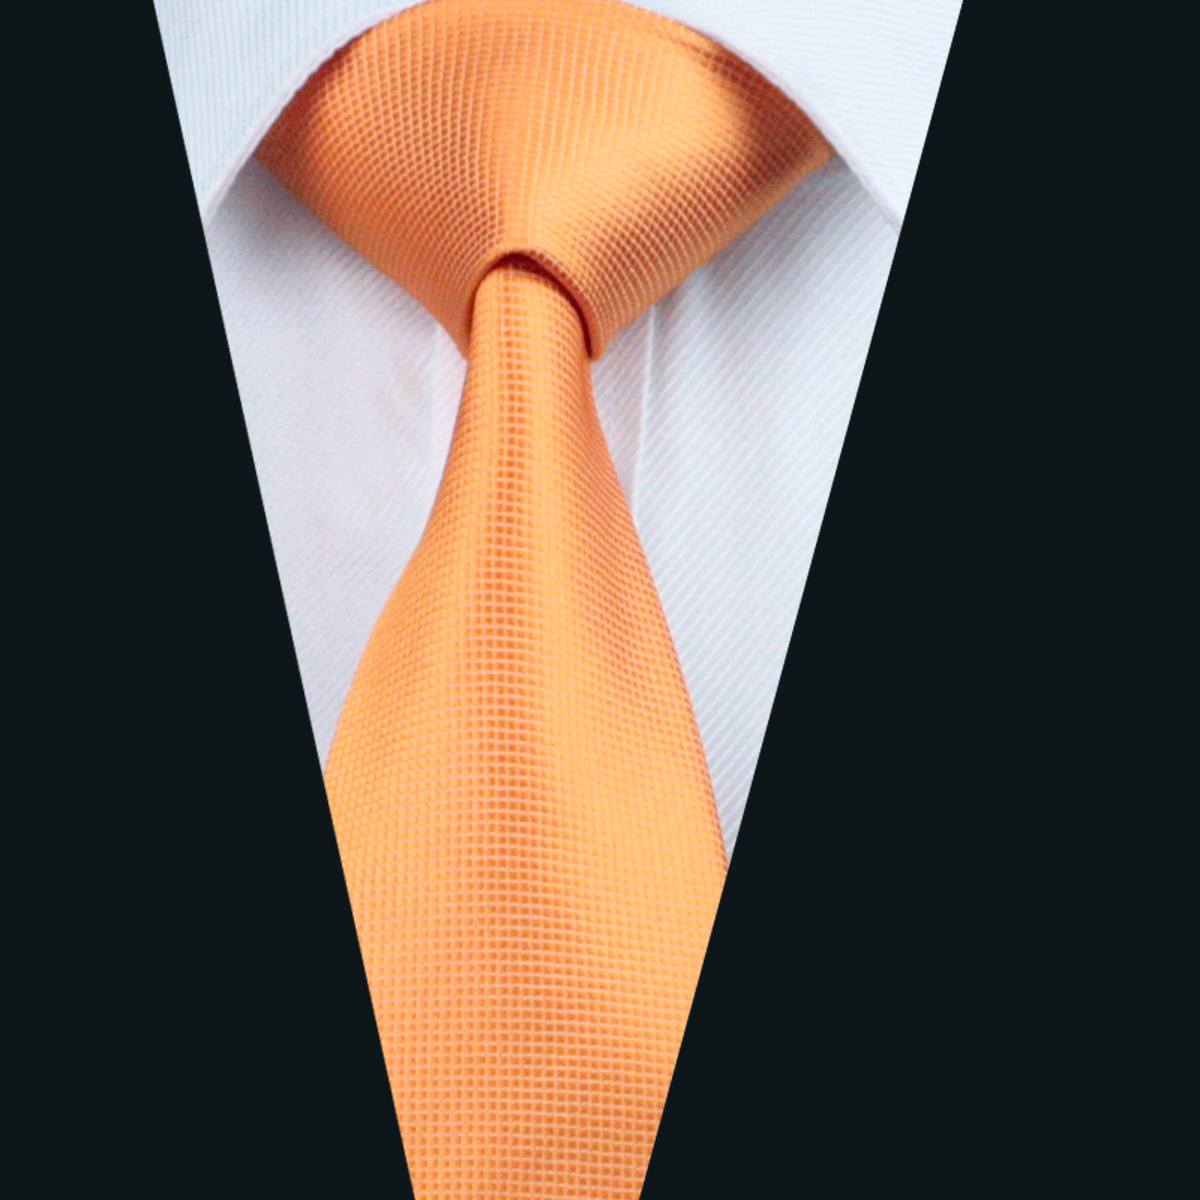 DH-356 Mens Silk Tie Orange Solid NeckTie 100% Silk Jacquard Ties For Men Business Wedding Party Free Shipping